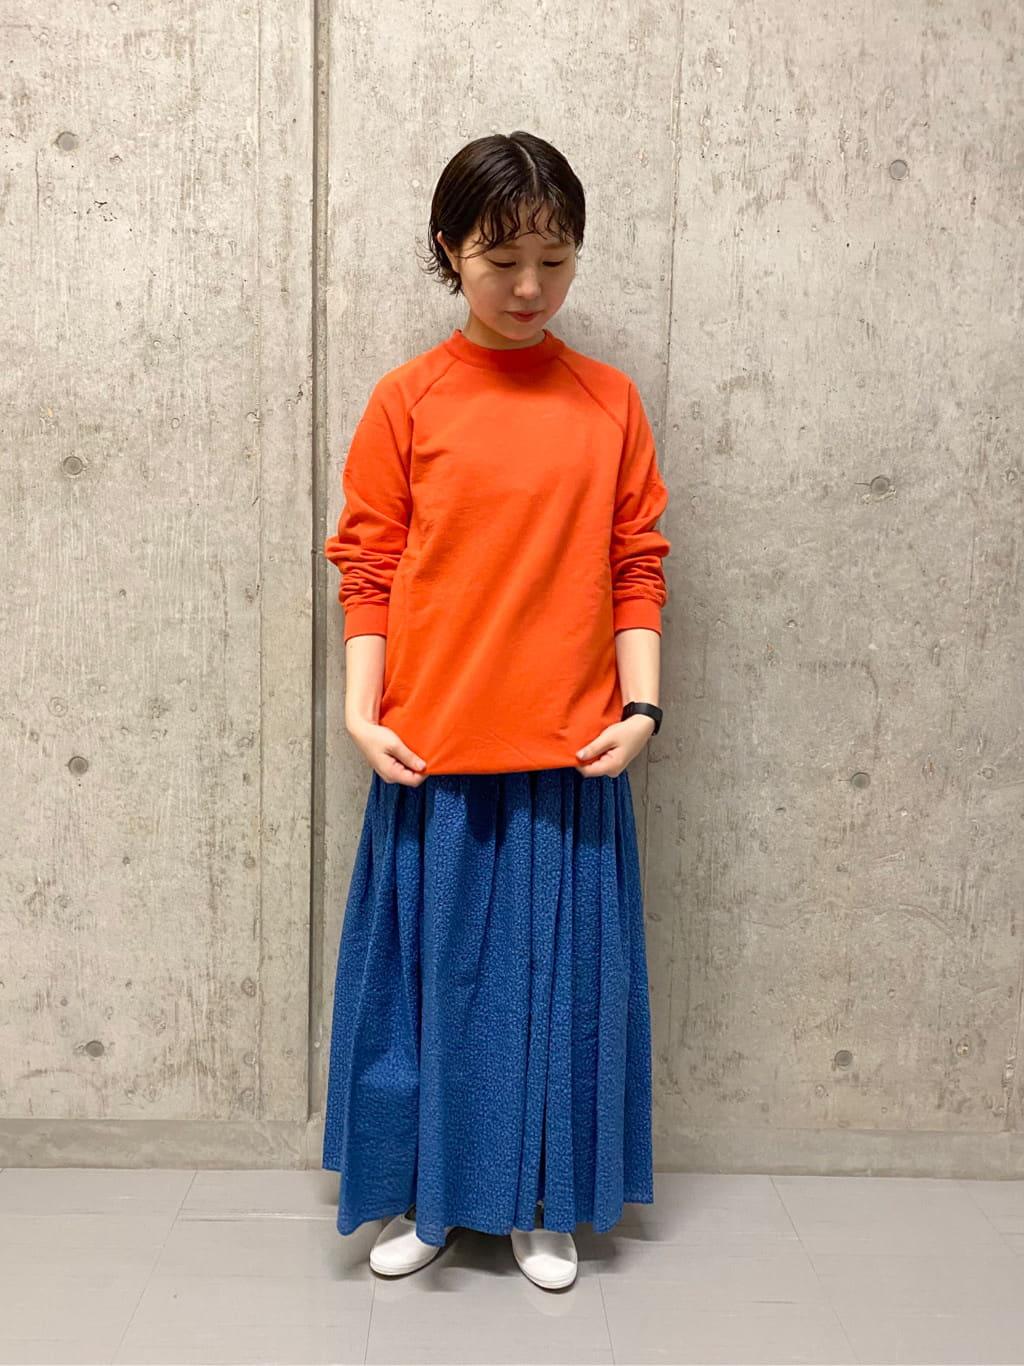 bulle de savon 阪急西宮ガーデンズ 身長:149cm 2021.08.17